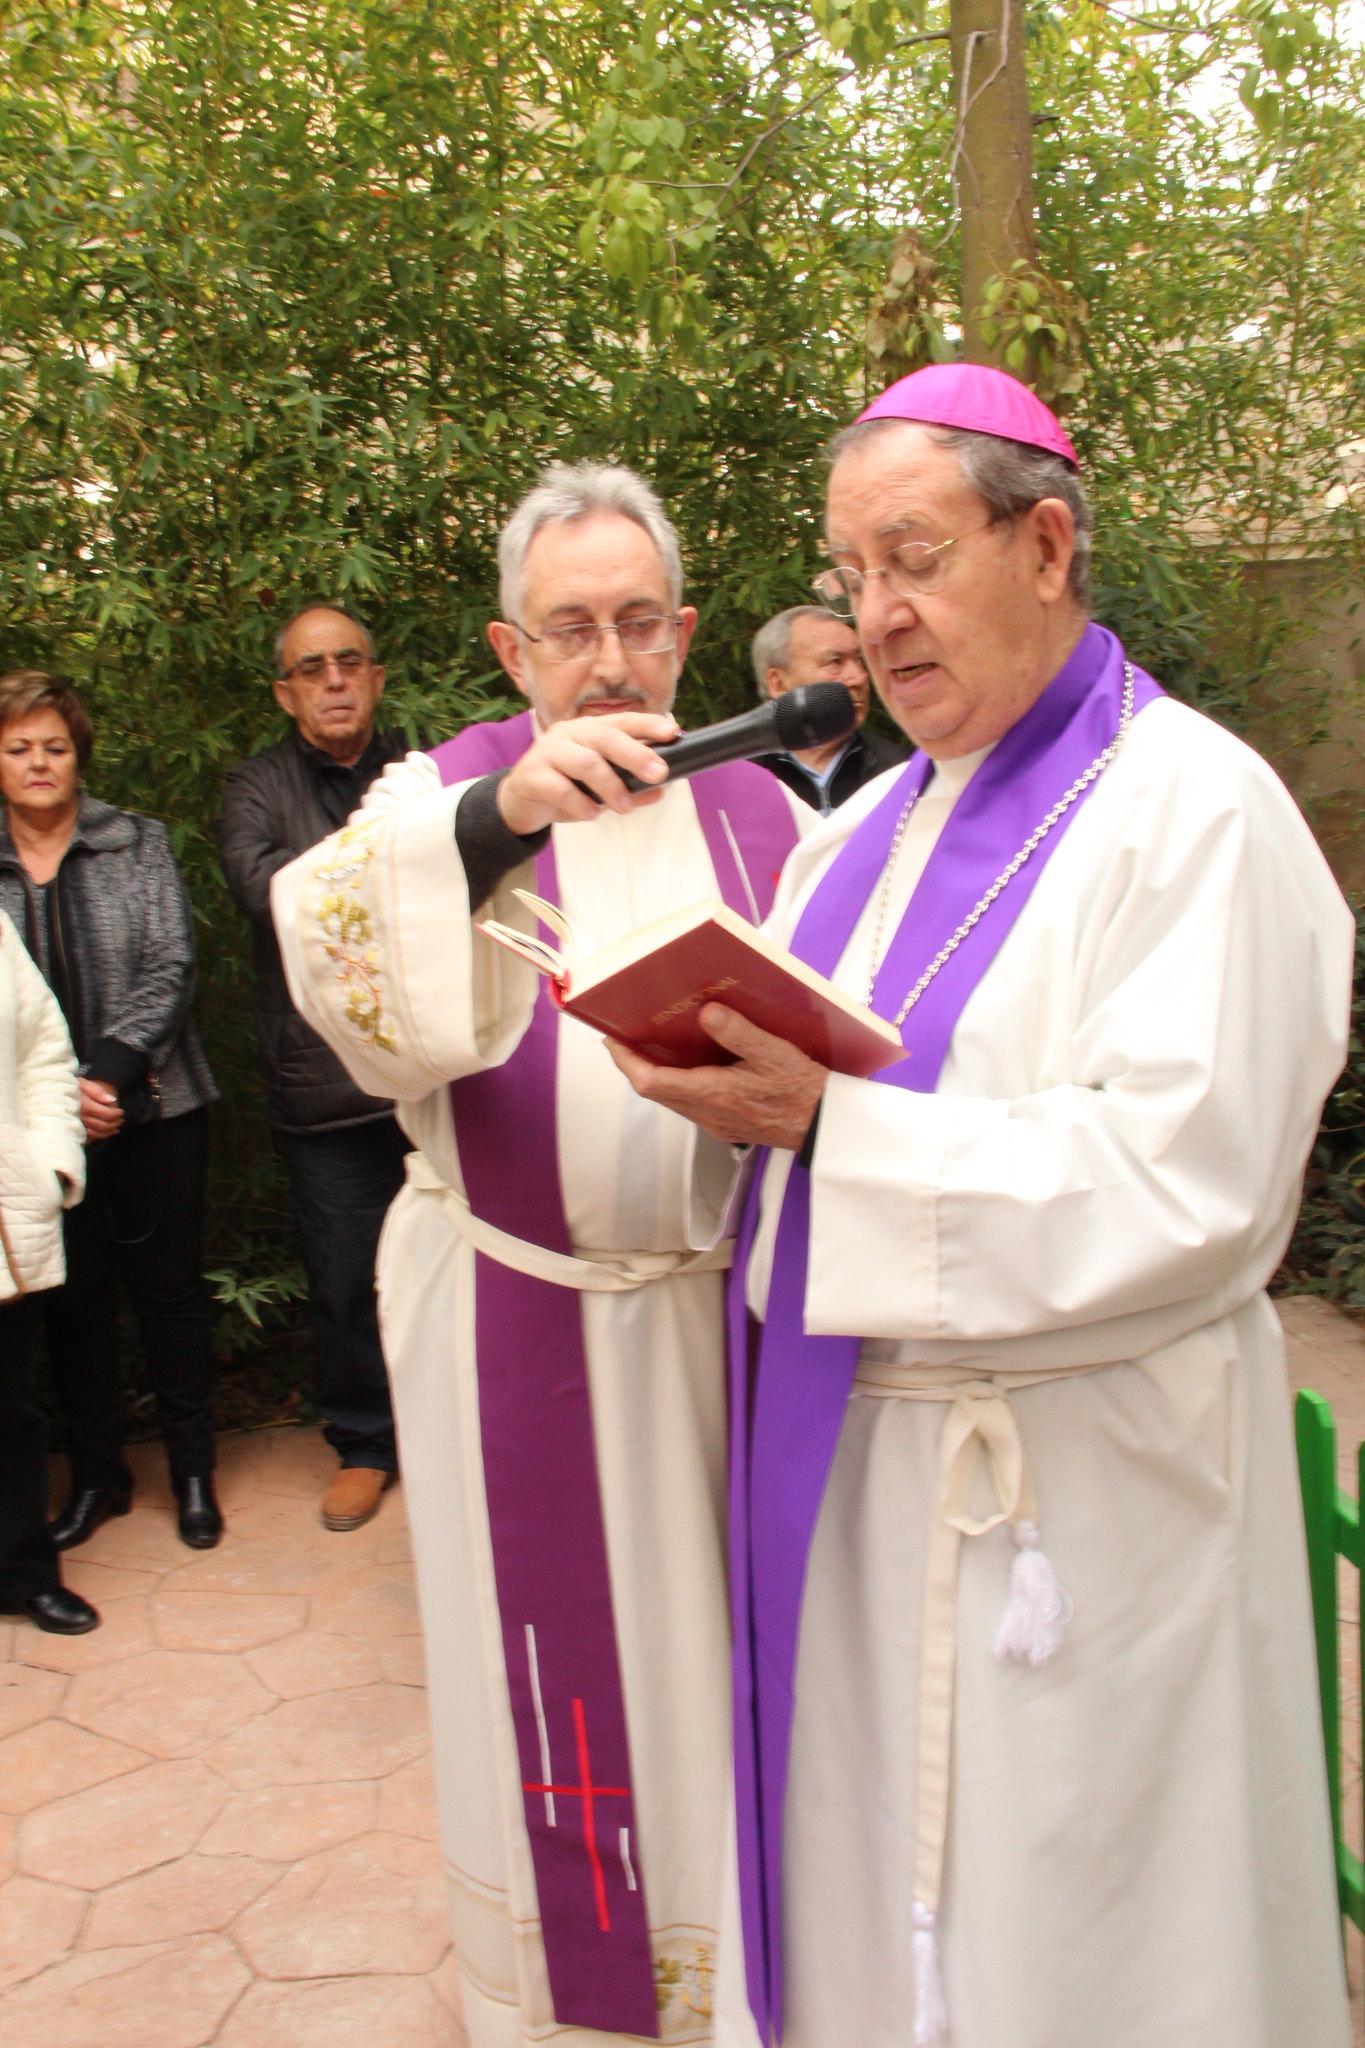 (2016-02-13) - Inauguración Virgen De Lourdes, La Molineta - Archivo La Molineta (075)